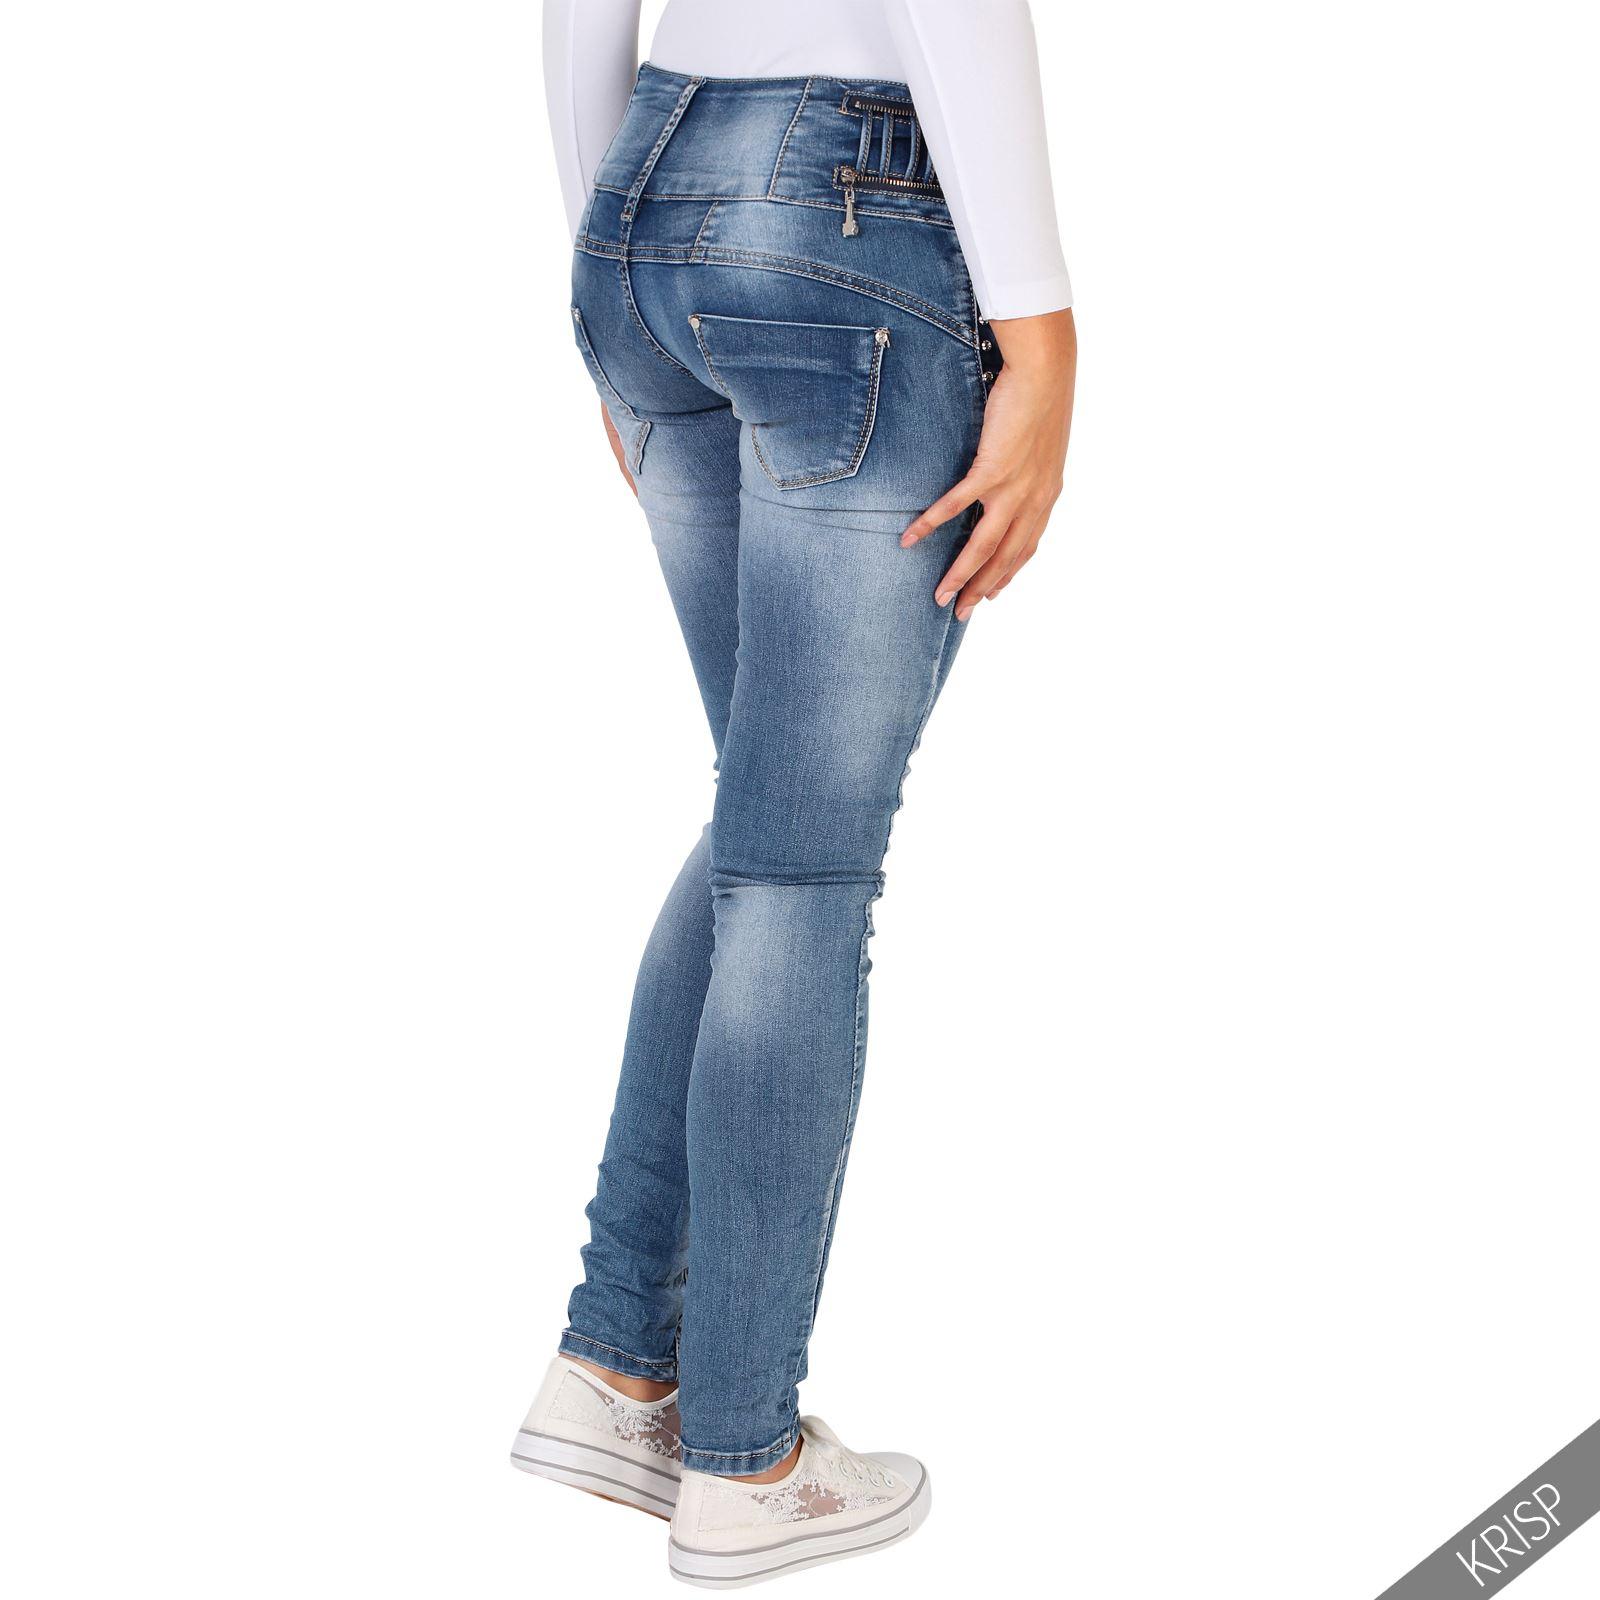 Creative Clothing Pants Recently Viewed Himalayan Hipster Pants Molecule Women